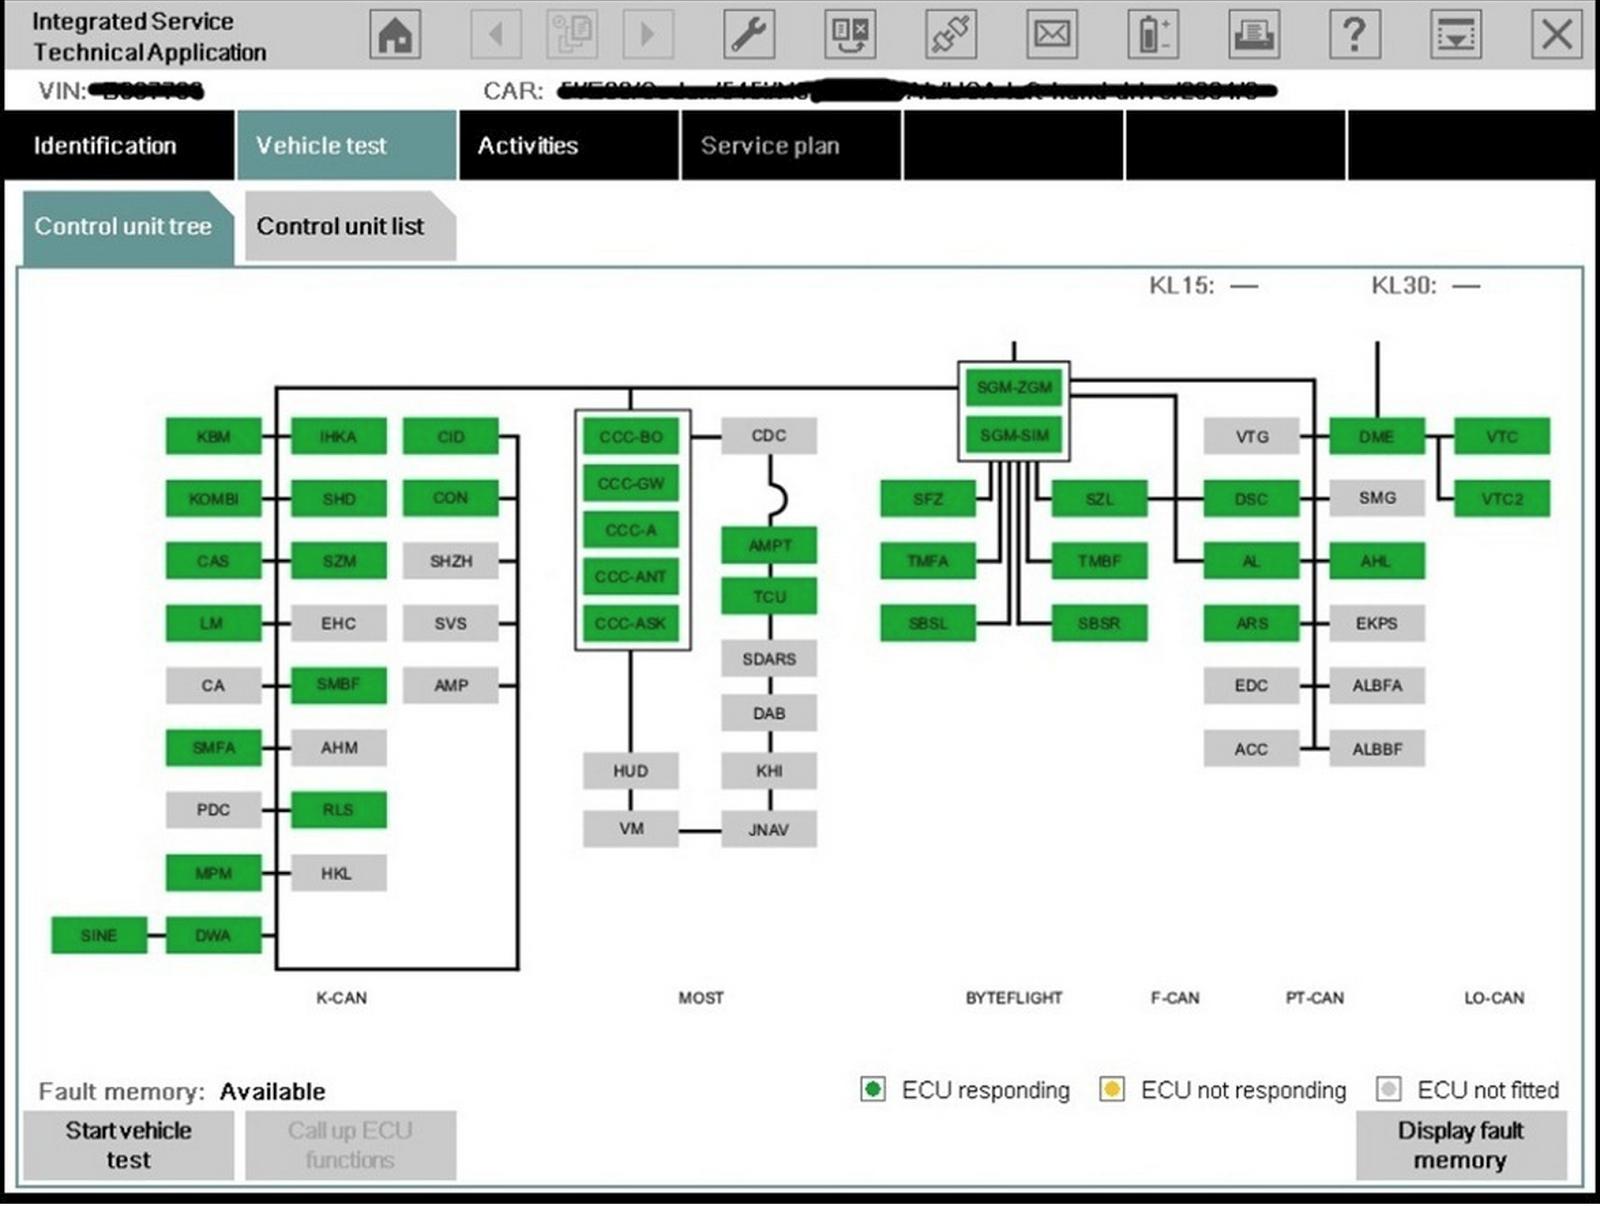 2018 BMW Diagnostic Software Ediabas INPA NCS Expert DIS ISTA Download